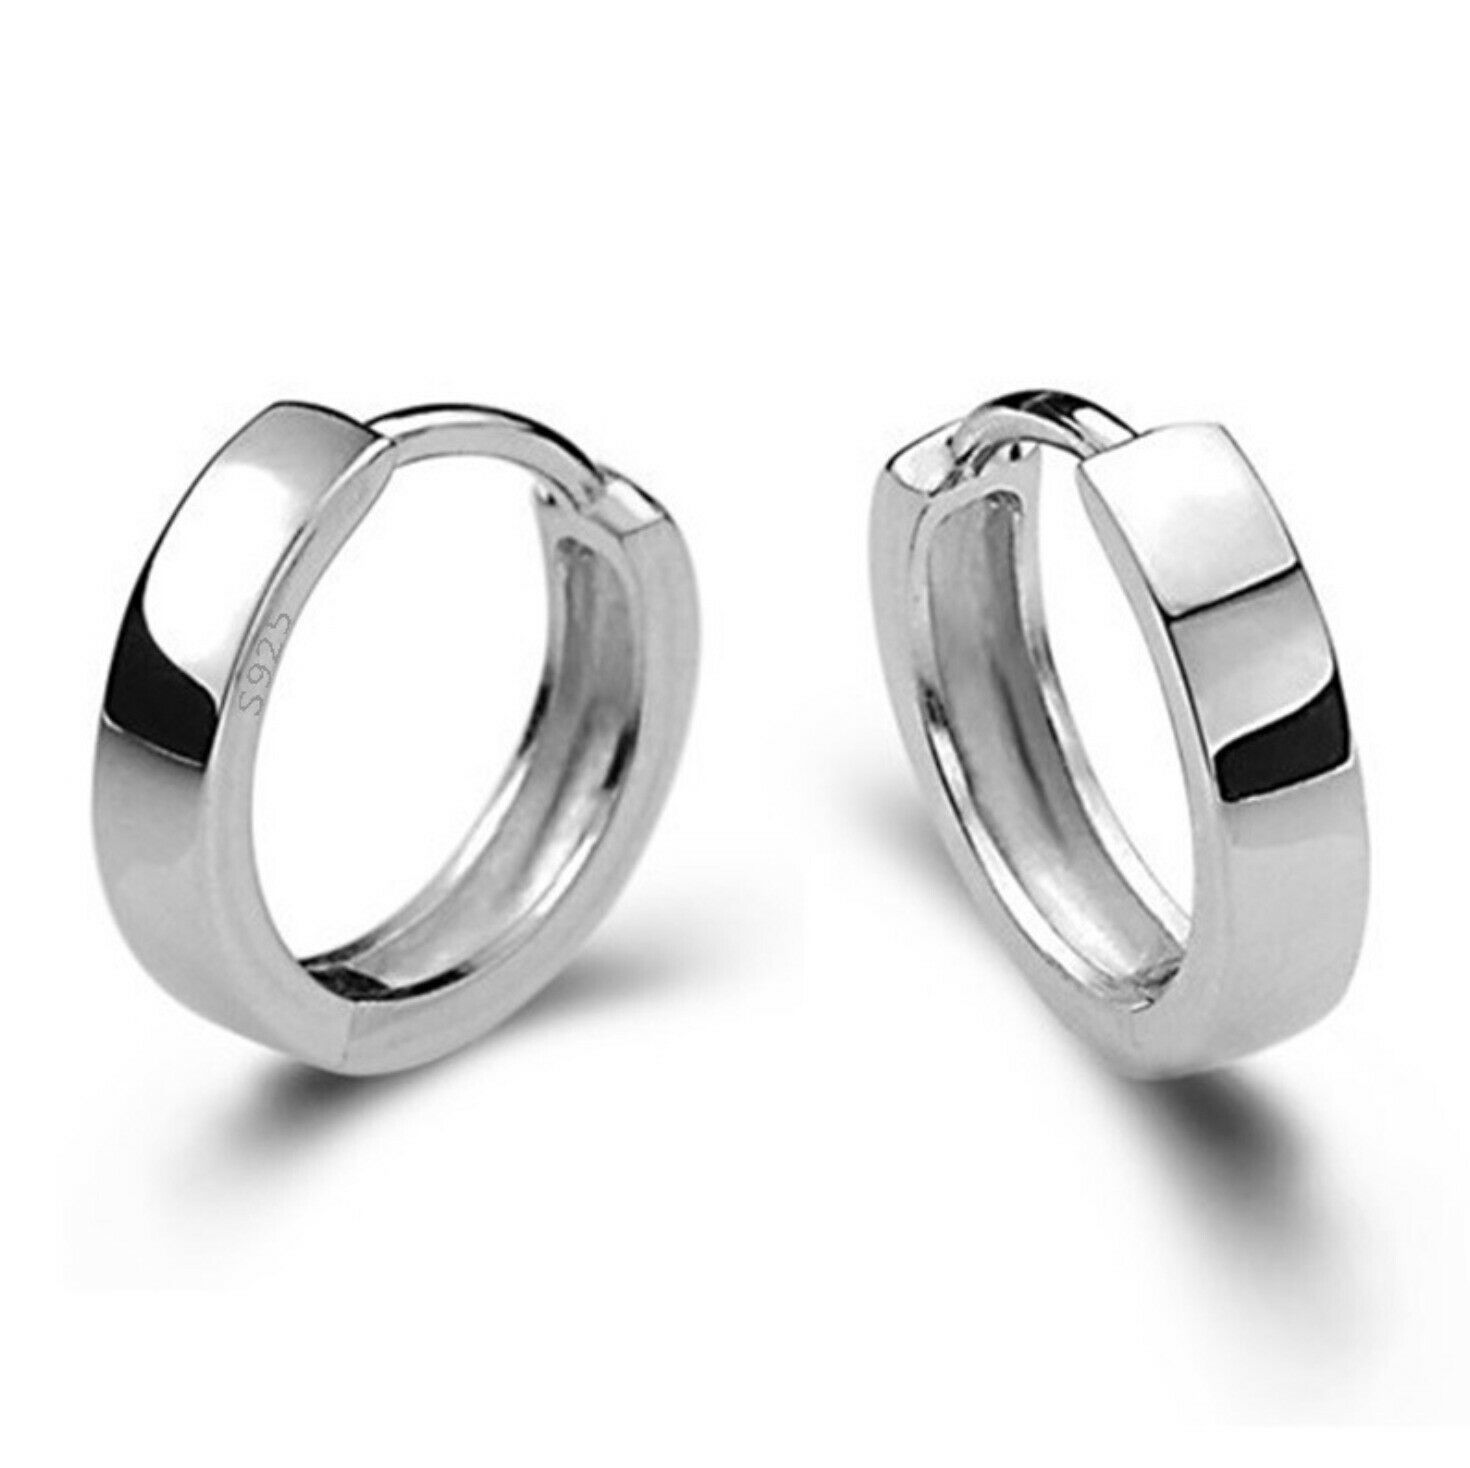 Jewellery - 925 Sterling Silver Huggie Hoop Clip Stud Earrings Womens Girls Jewellery Gift